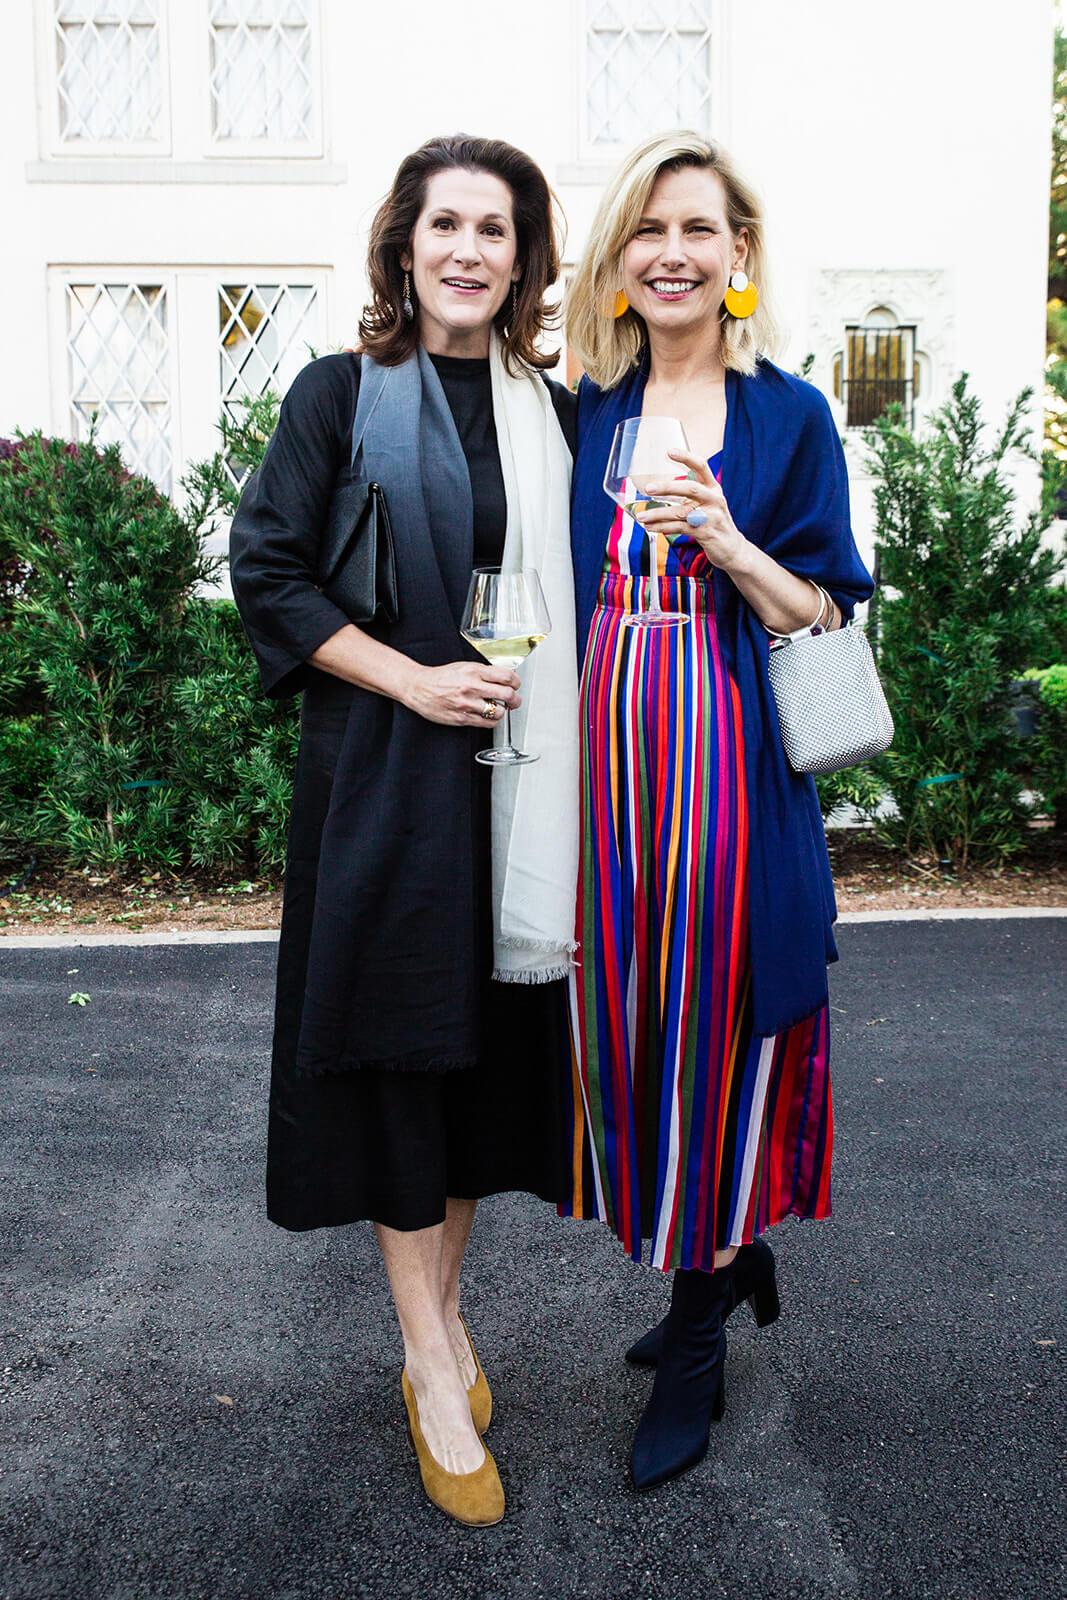 Christine Stewart and Susan Monroe